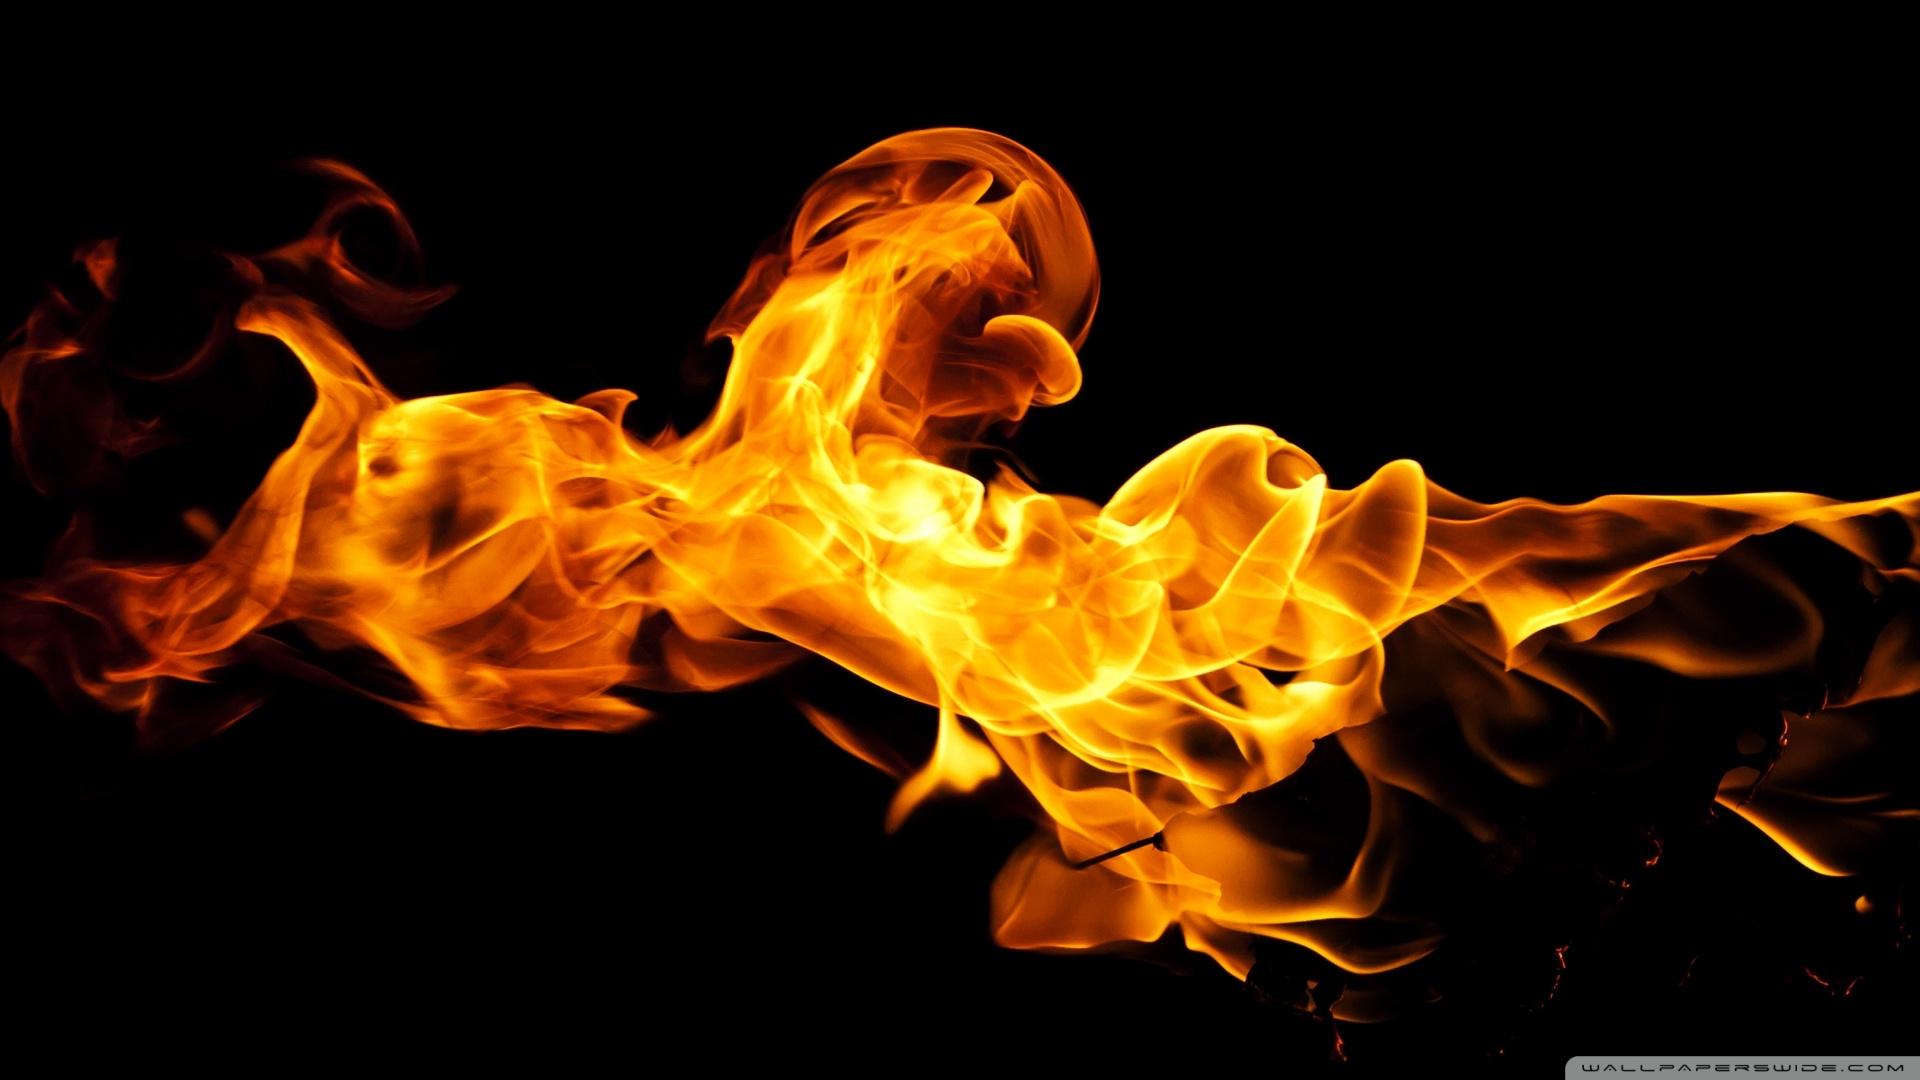 Slideshows - m - Tyler, Longview, Jacksonville ETX Pictures of white fire